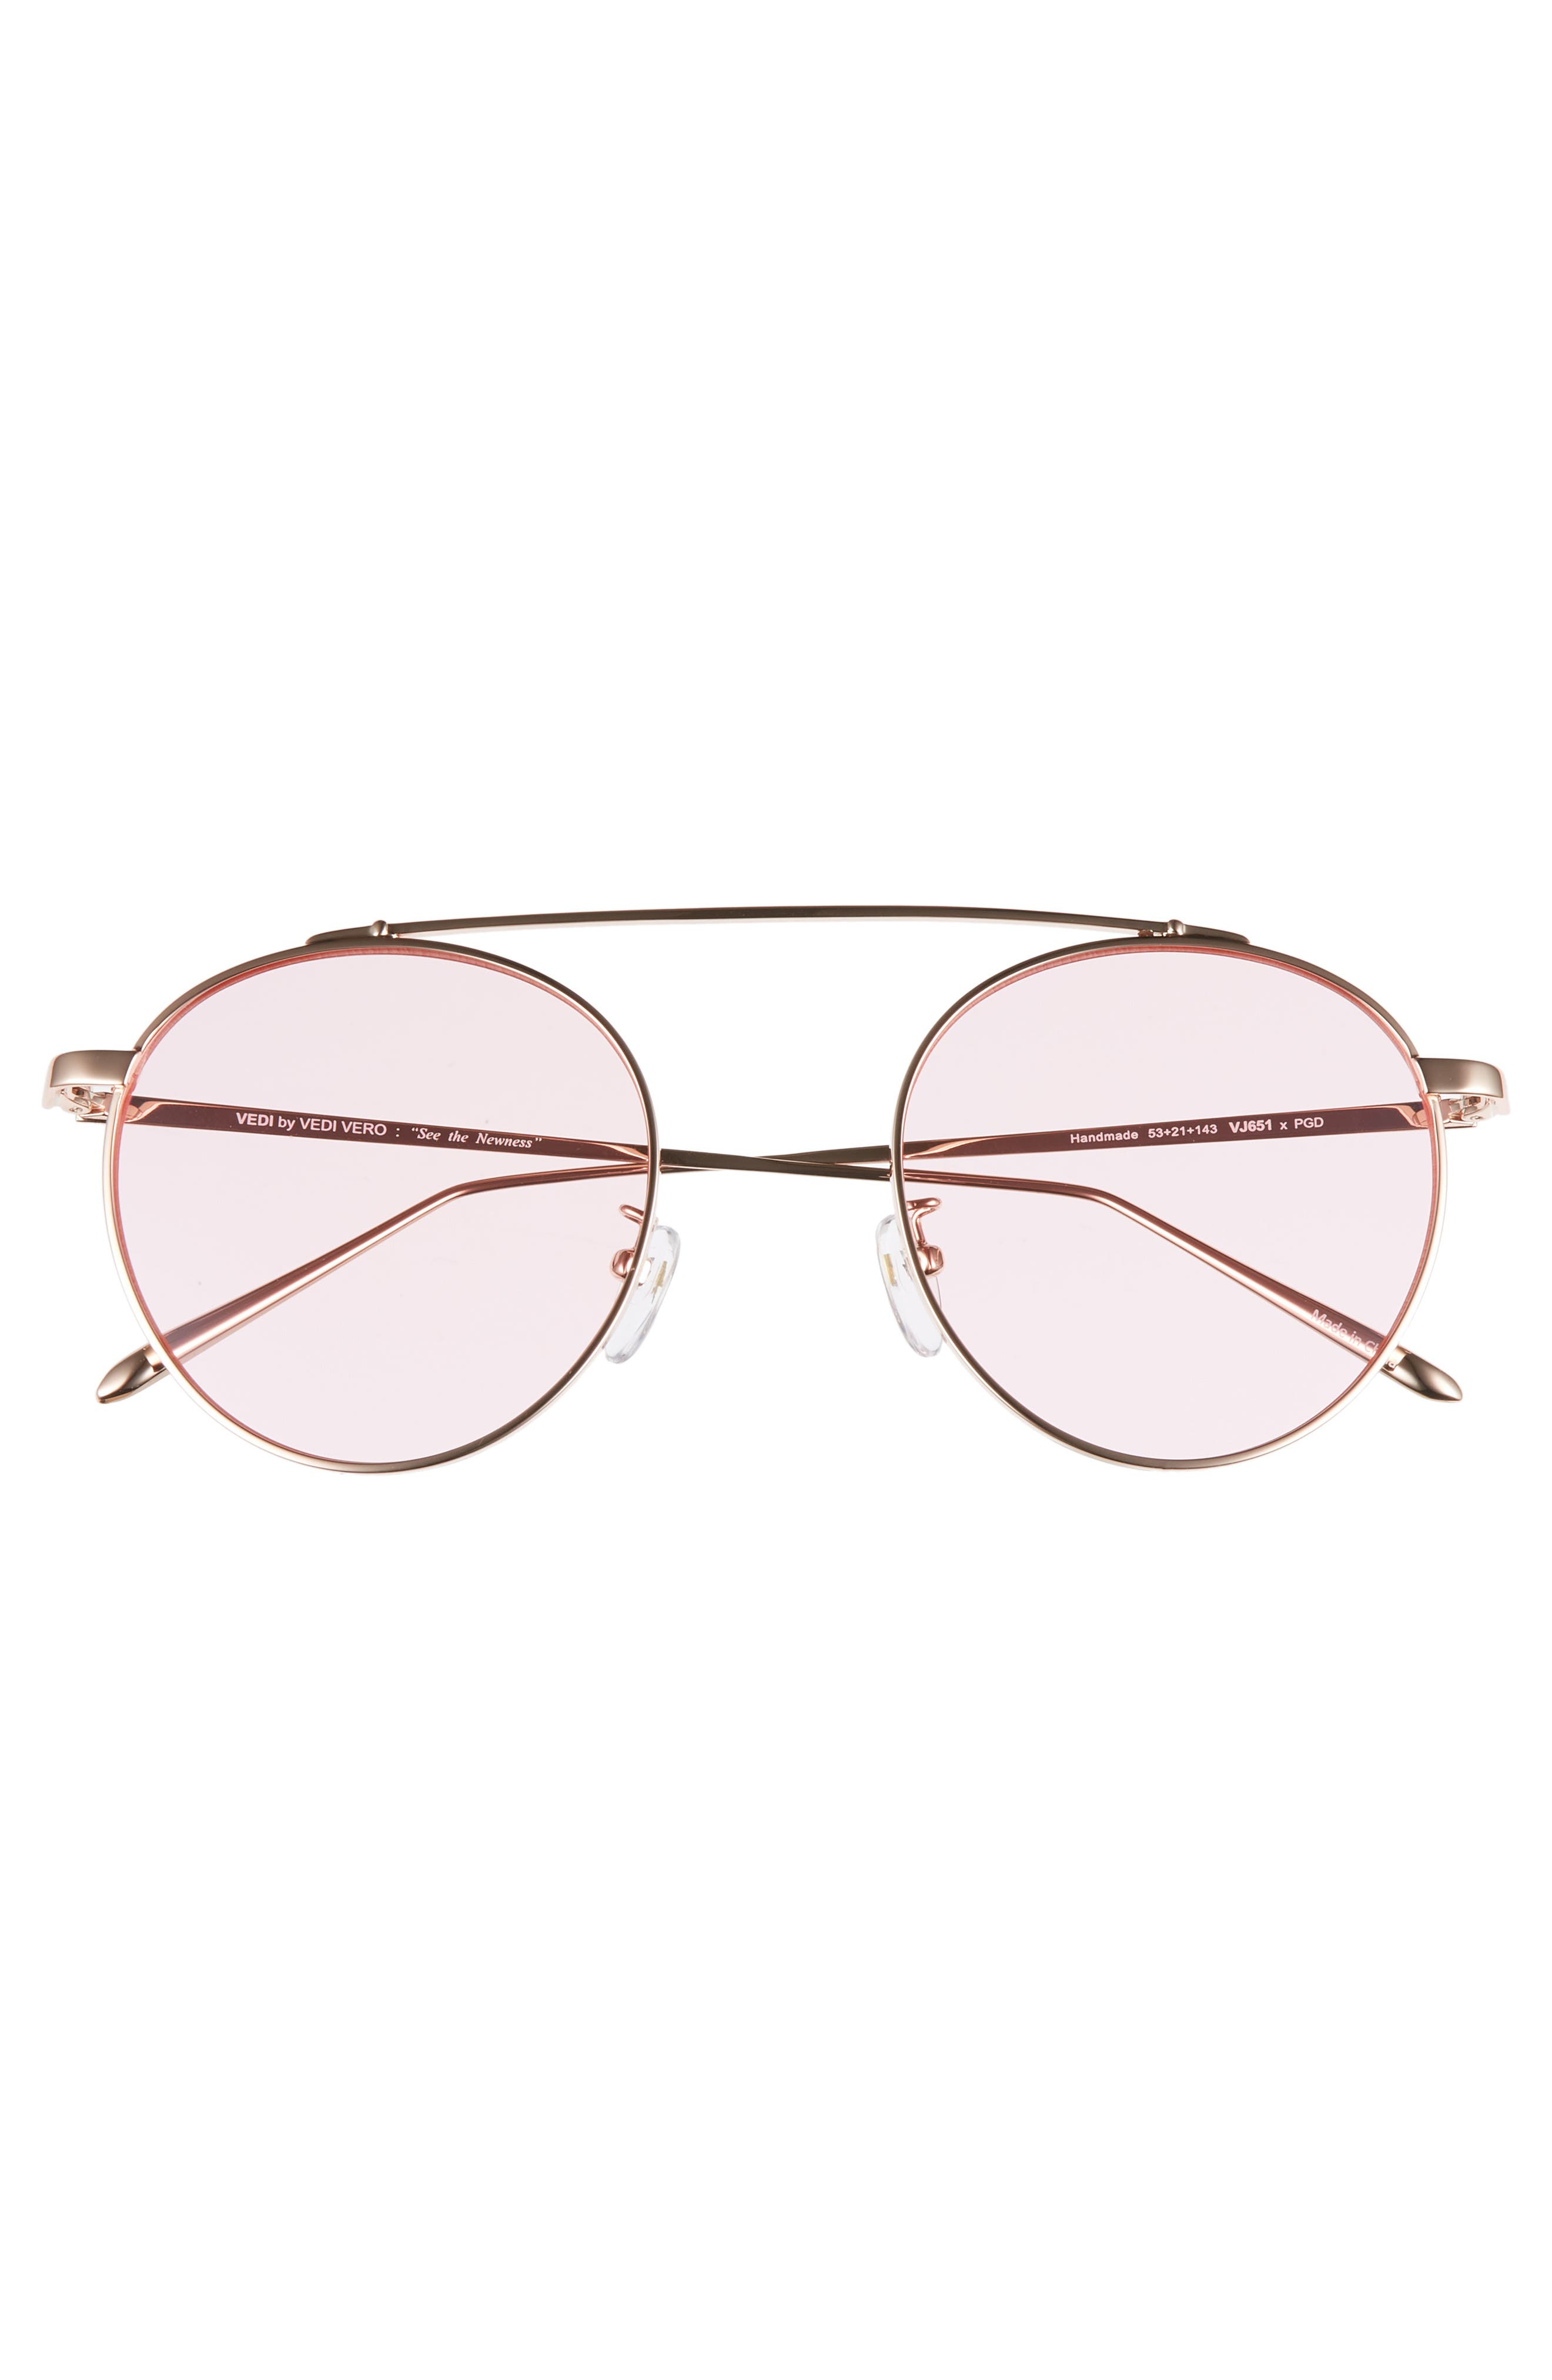 53mm Round Sunglasses,                             Alternate thumbnail 3, color,                             Rosegld/Pink